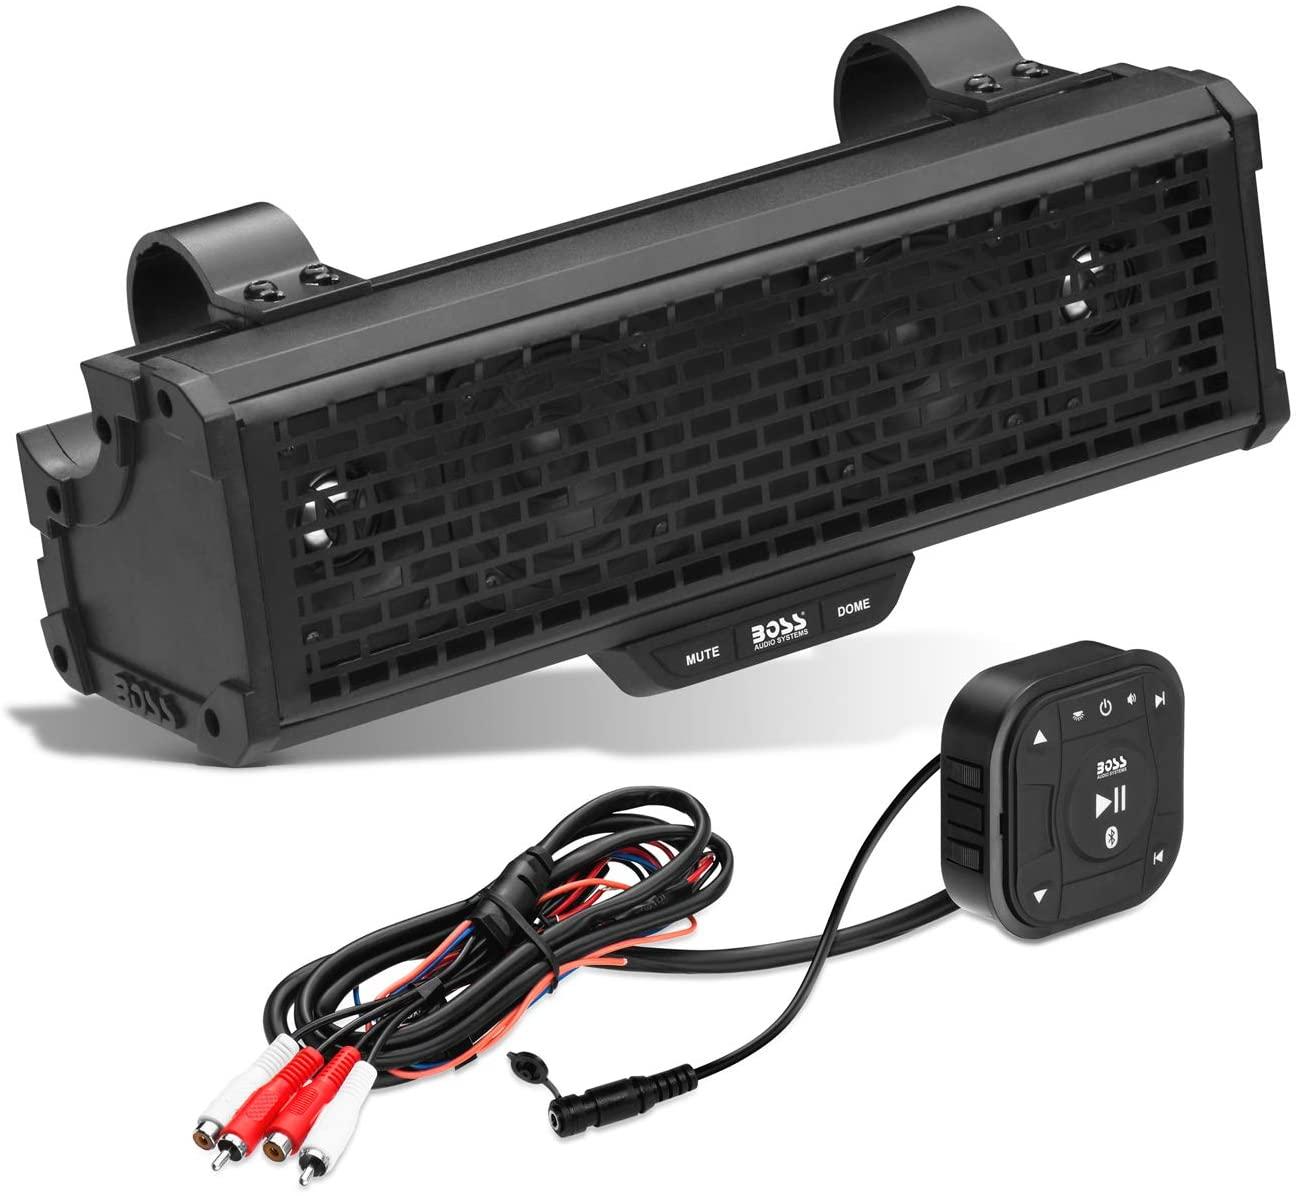 15% off BOSS Audio Systems ATV/UTV Soundbars (14 inch 27 inch & 34 inch models) $195.49 + FS with PRIME